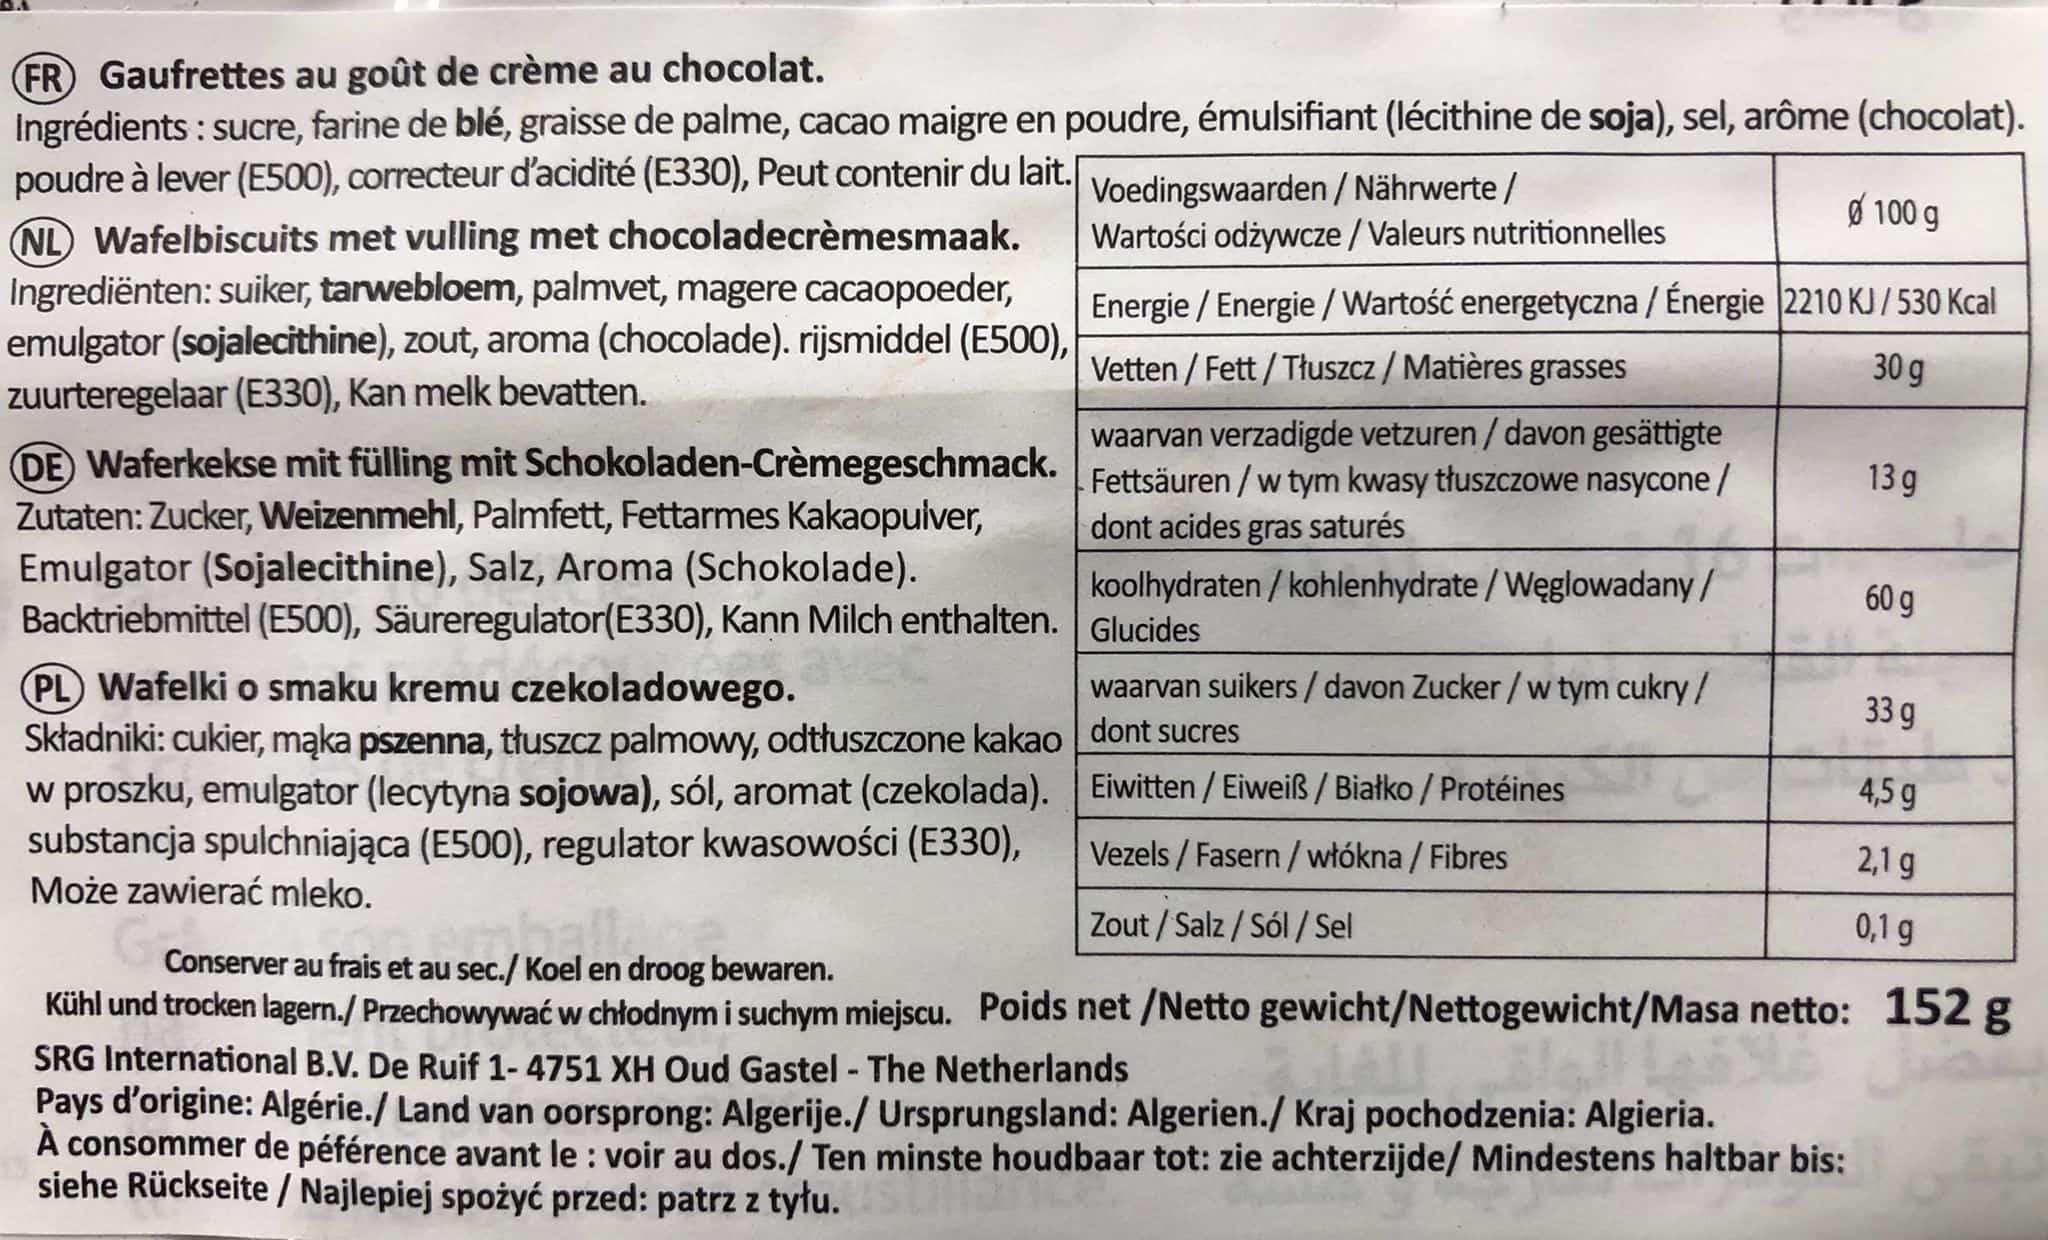 LU Croustille Waffelkeks mit Schokoladengeschmack 152g